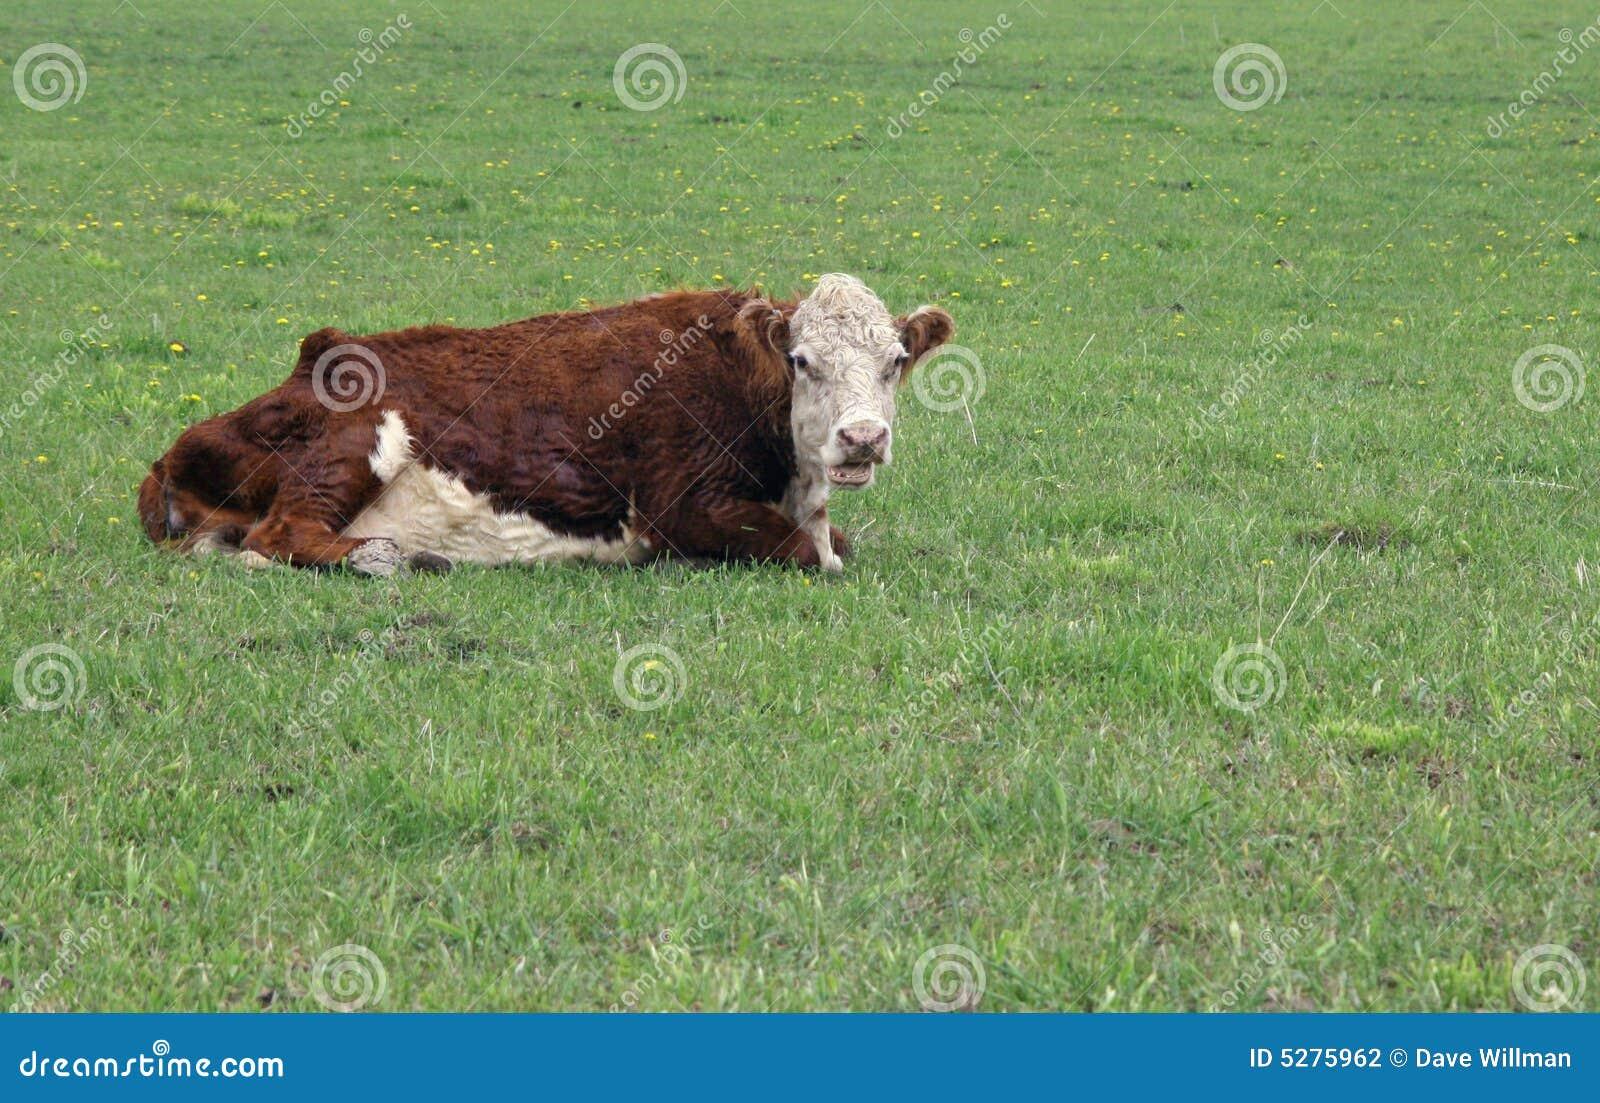 Toro de Hereford